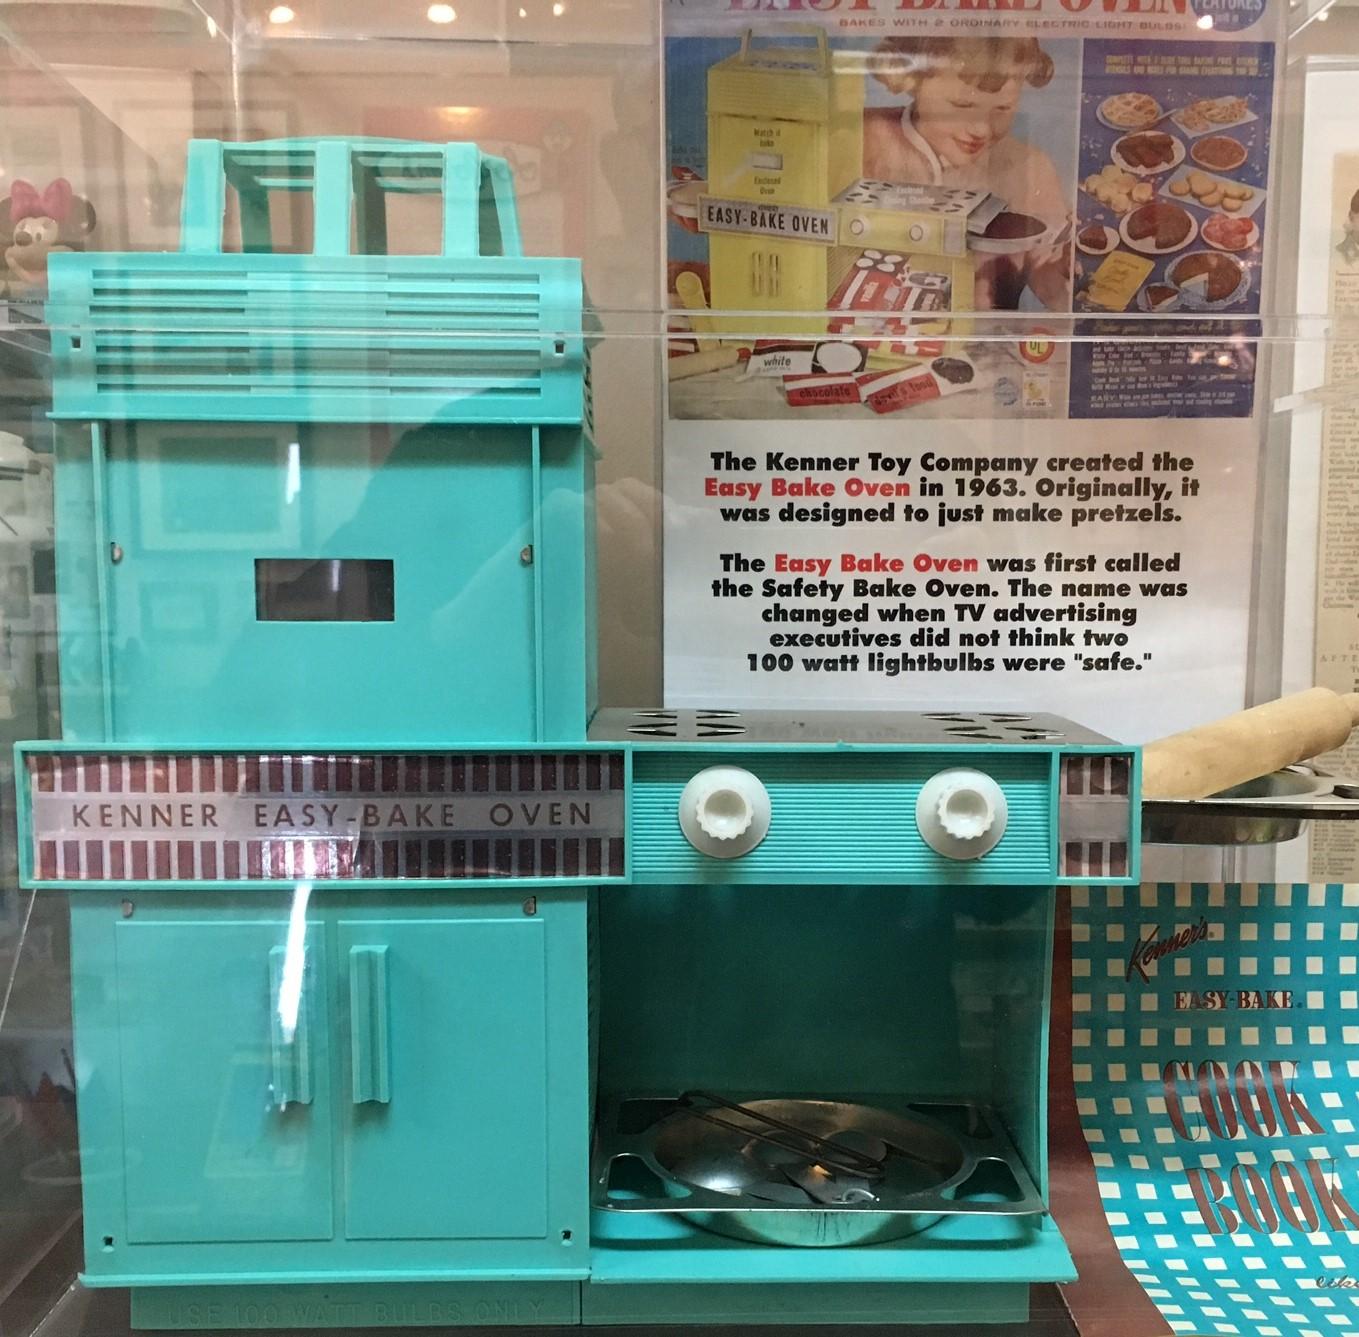 Classic Easy Bake Oven (Photo by MontaraManDan)